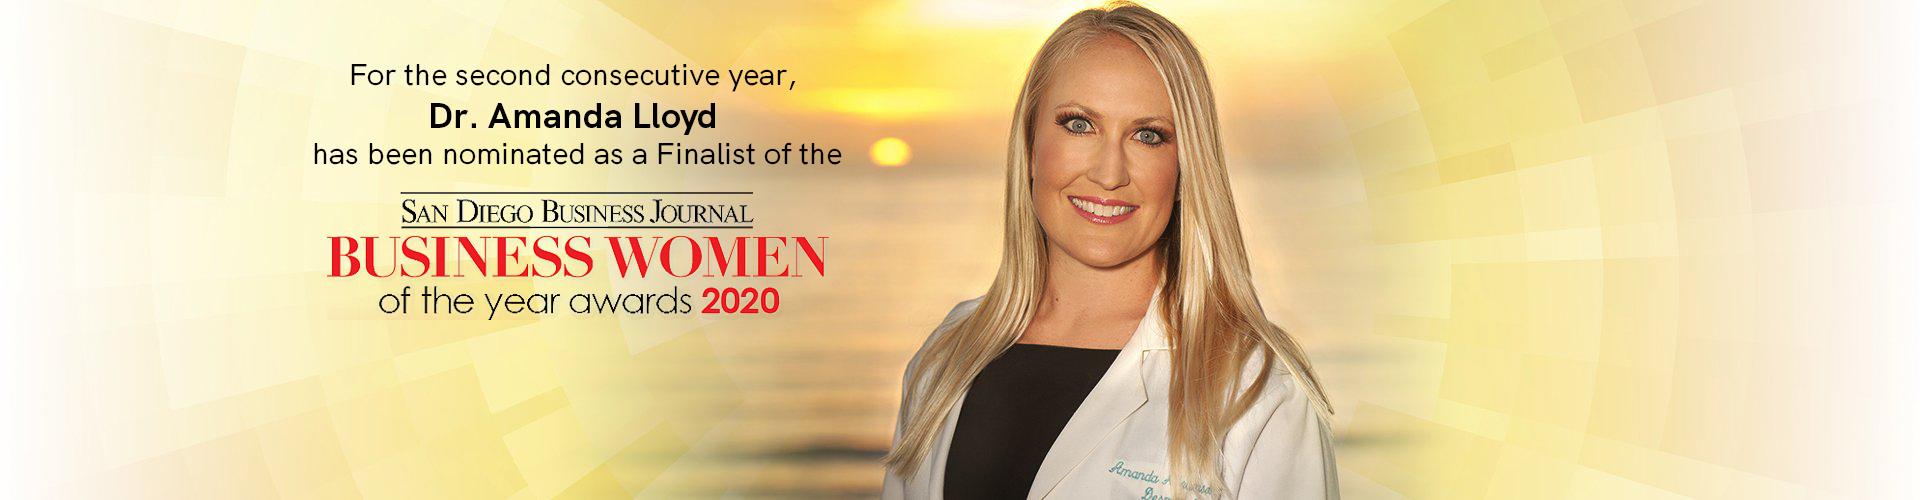 Dr. Amanda Lloyd - Nominee of San Diego Business Woman of the Year Award